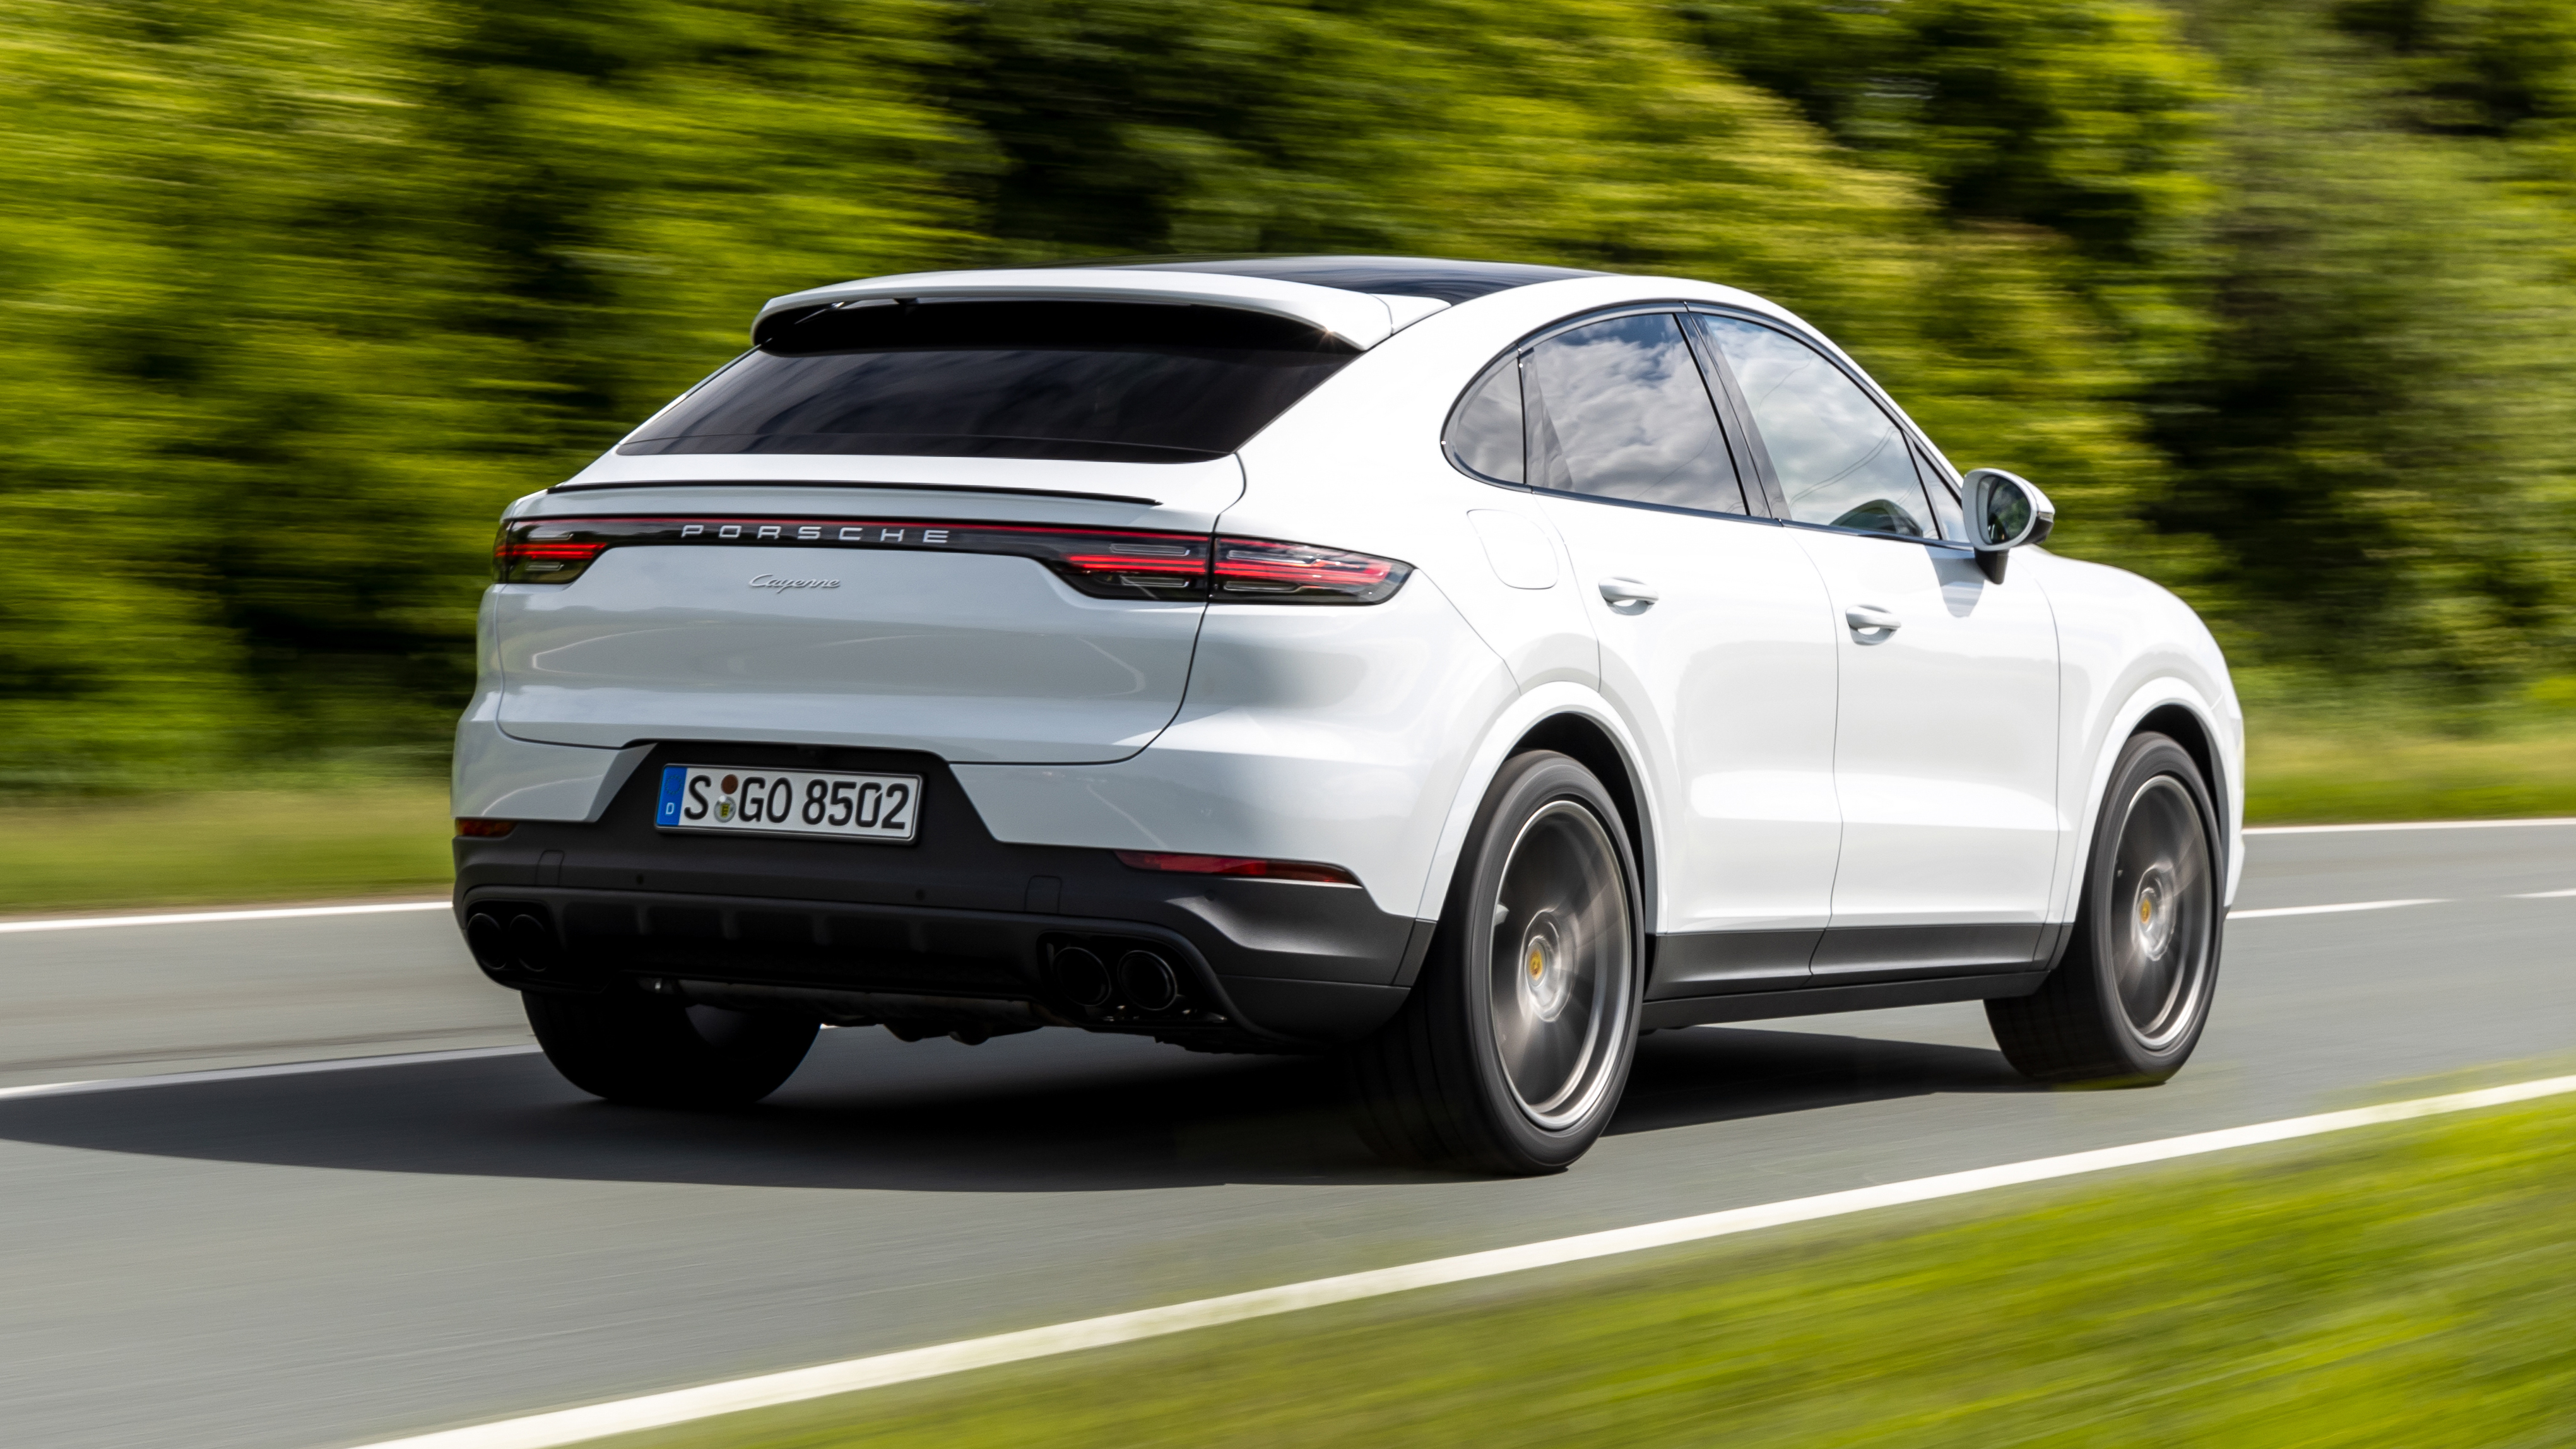 Porsche Cayenne Coupe Review Is The Base Spec Quick Enough Top Gear